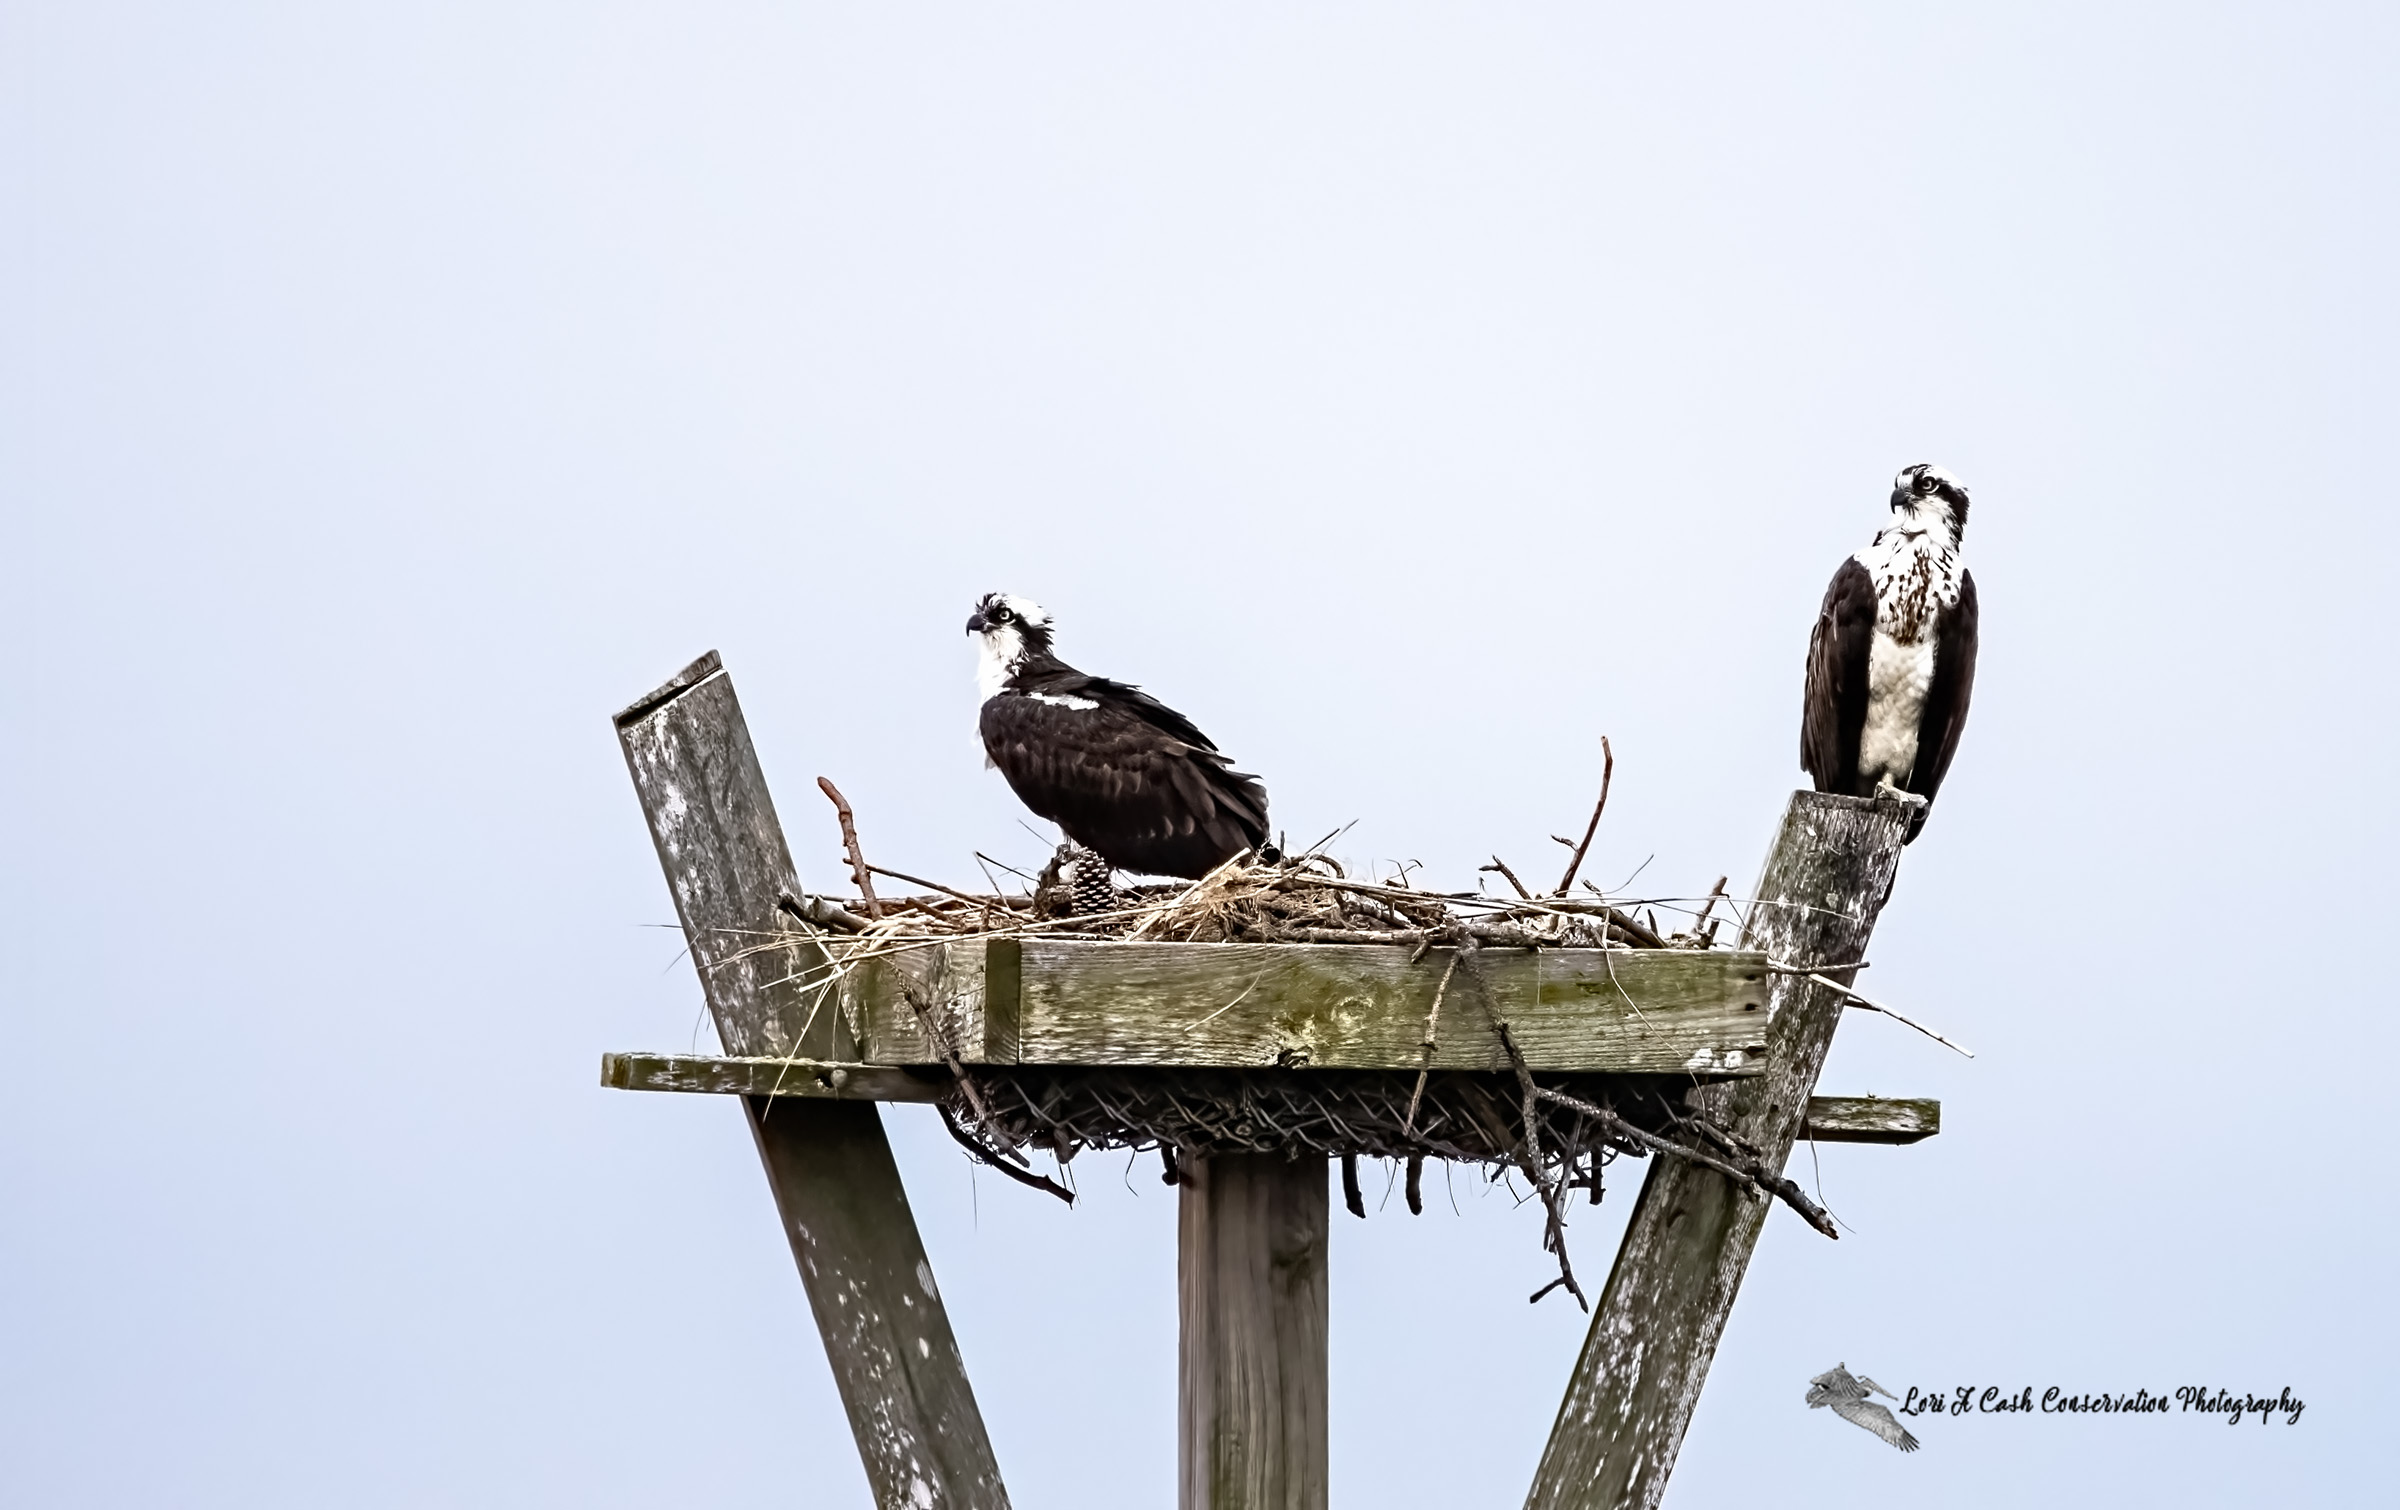 Pair of osprey resting on their nest platform along the edge of Hampton River at Fort Monroe National Park in Hampton, Virginia.